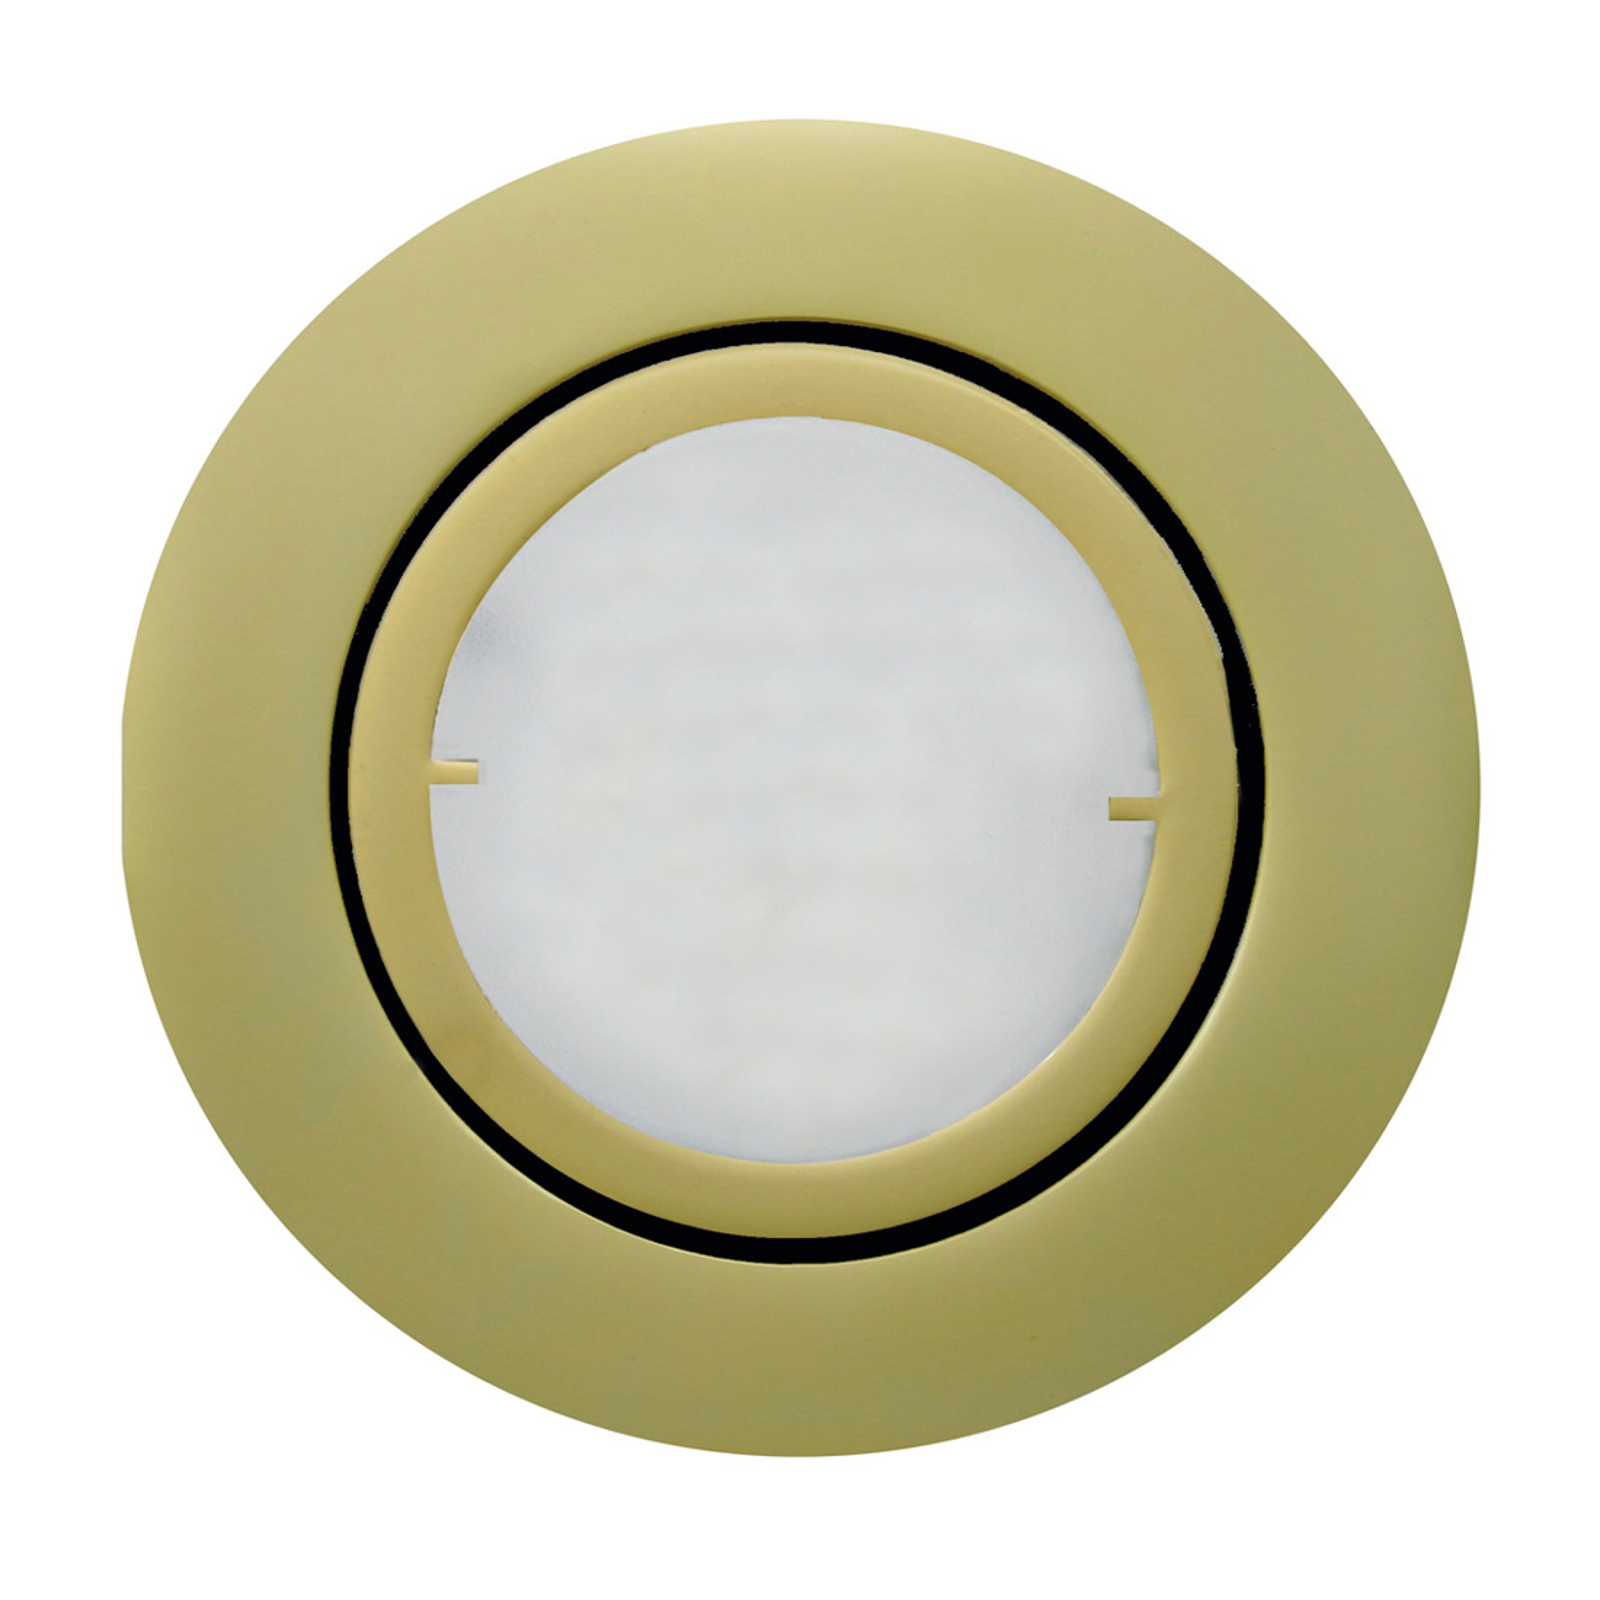 Matgouden LED inbouwlamp Joanie